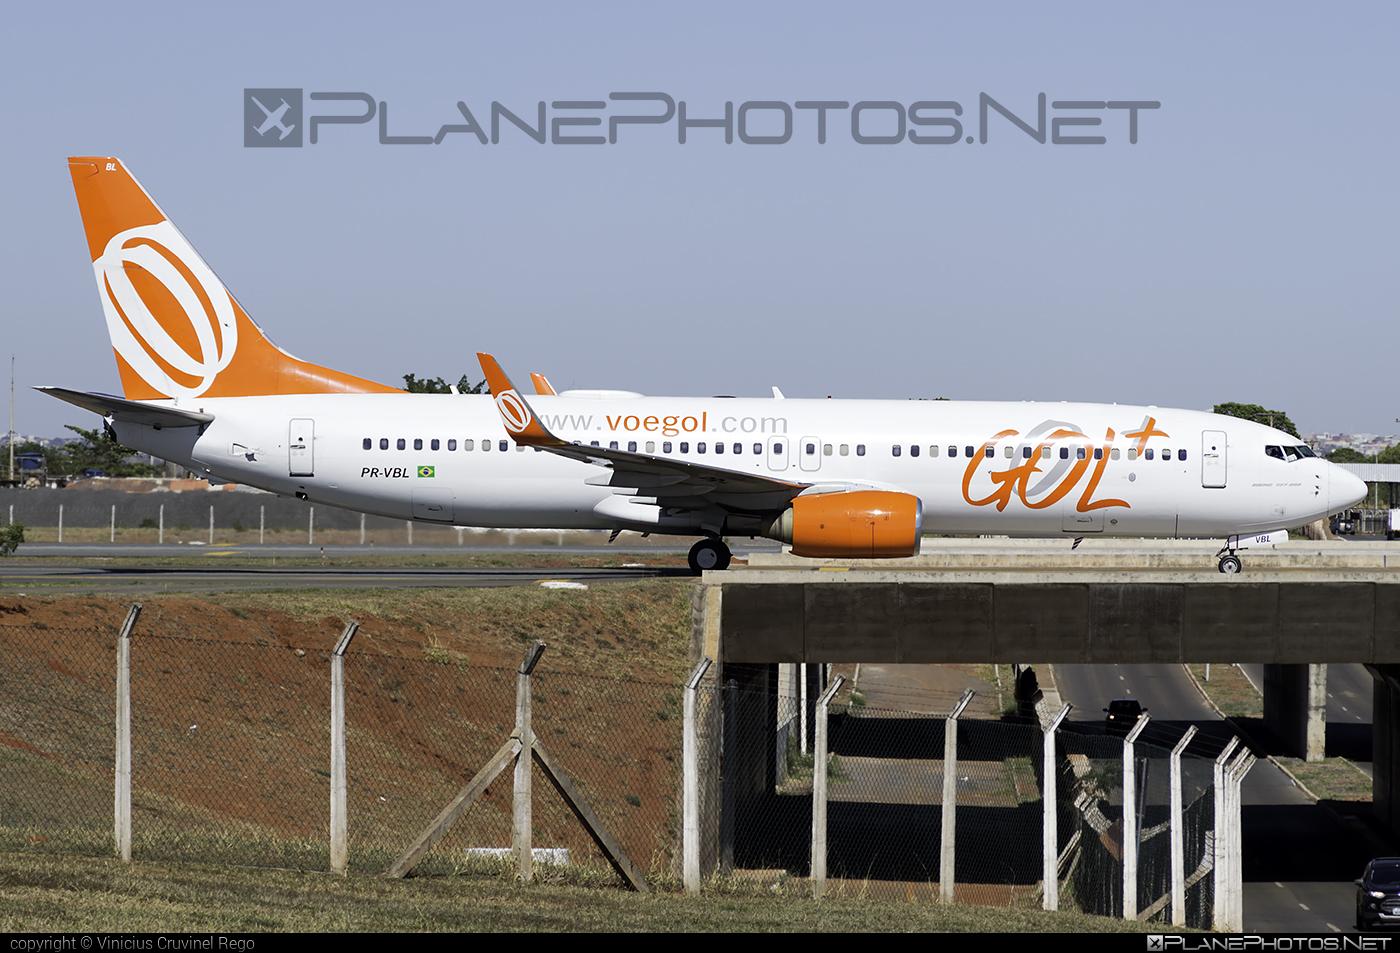 Boeing 737-800 - PR-VBL operated by GOL Linhas Aéreas Inteligentes #b737 #b737nextgen #b737ng #boeing #boeing737